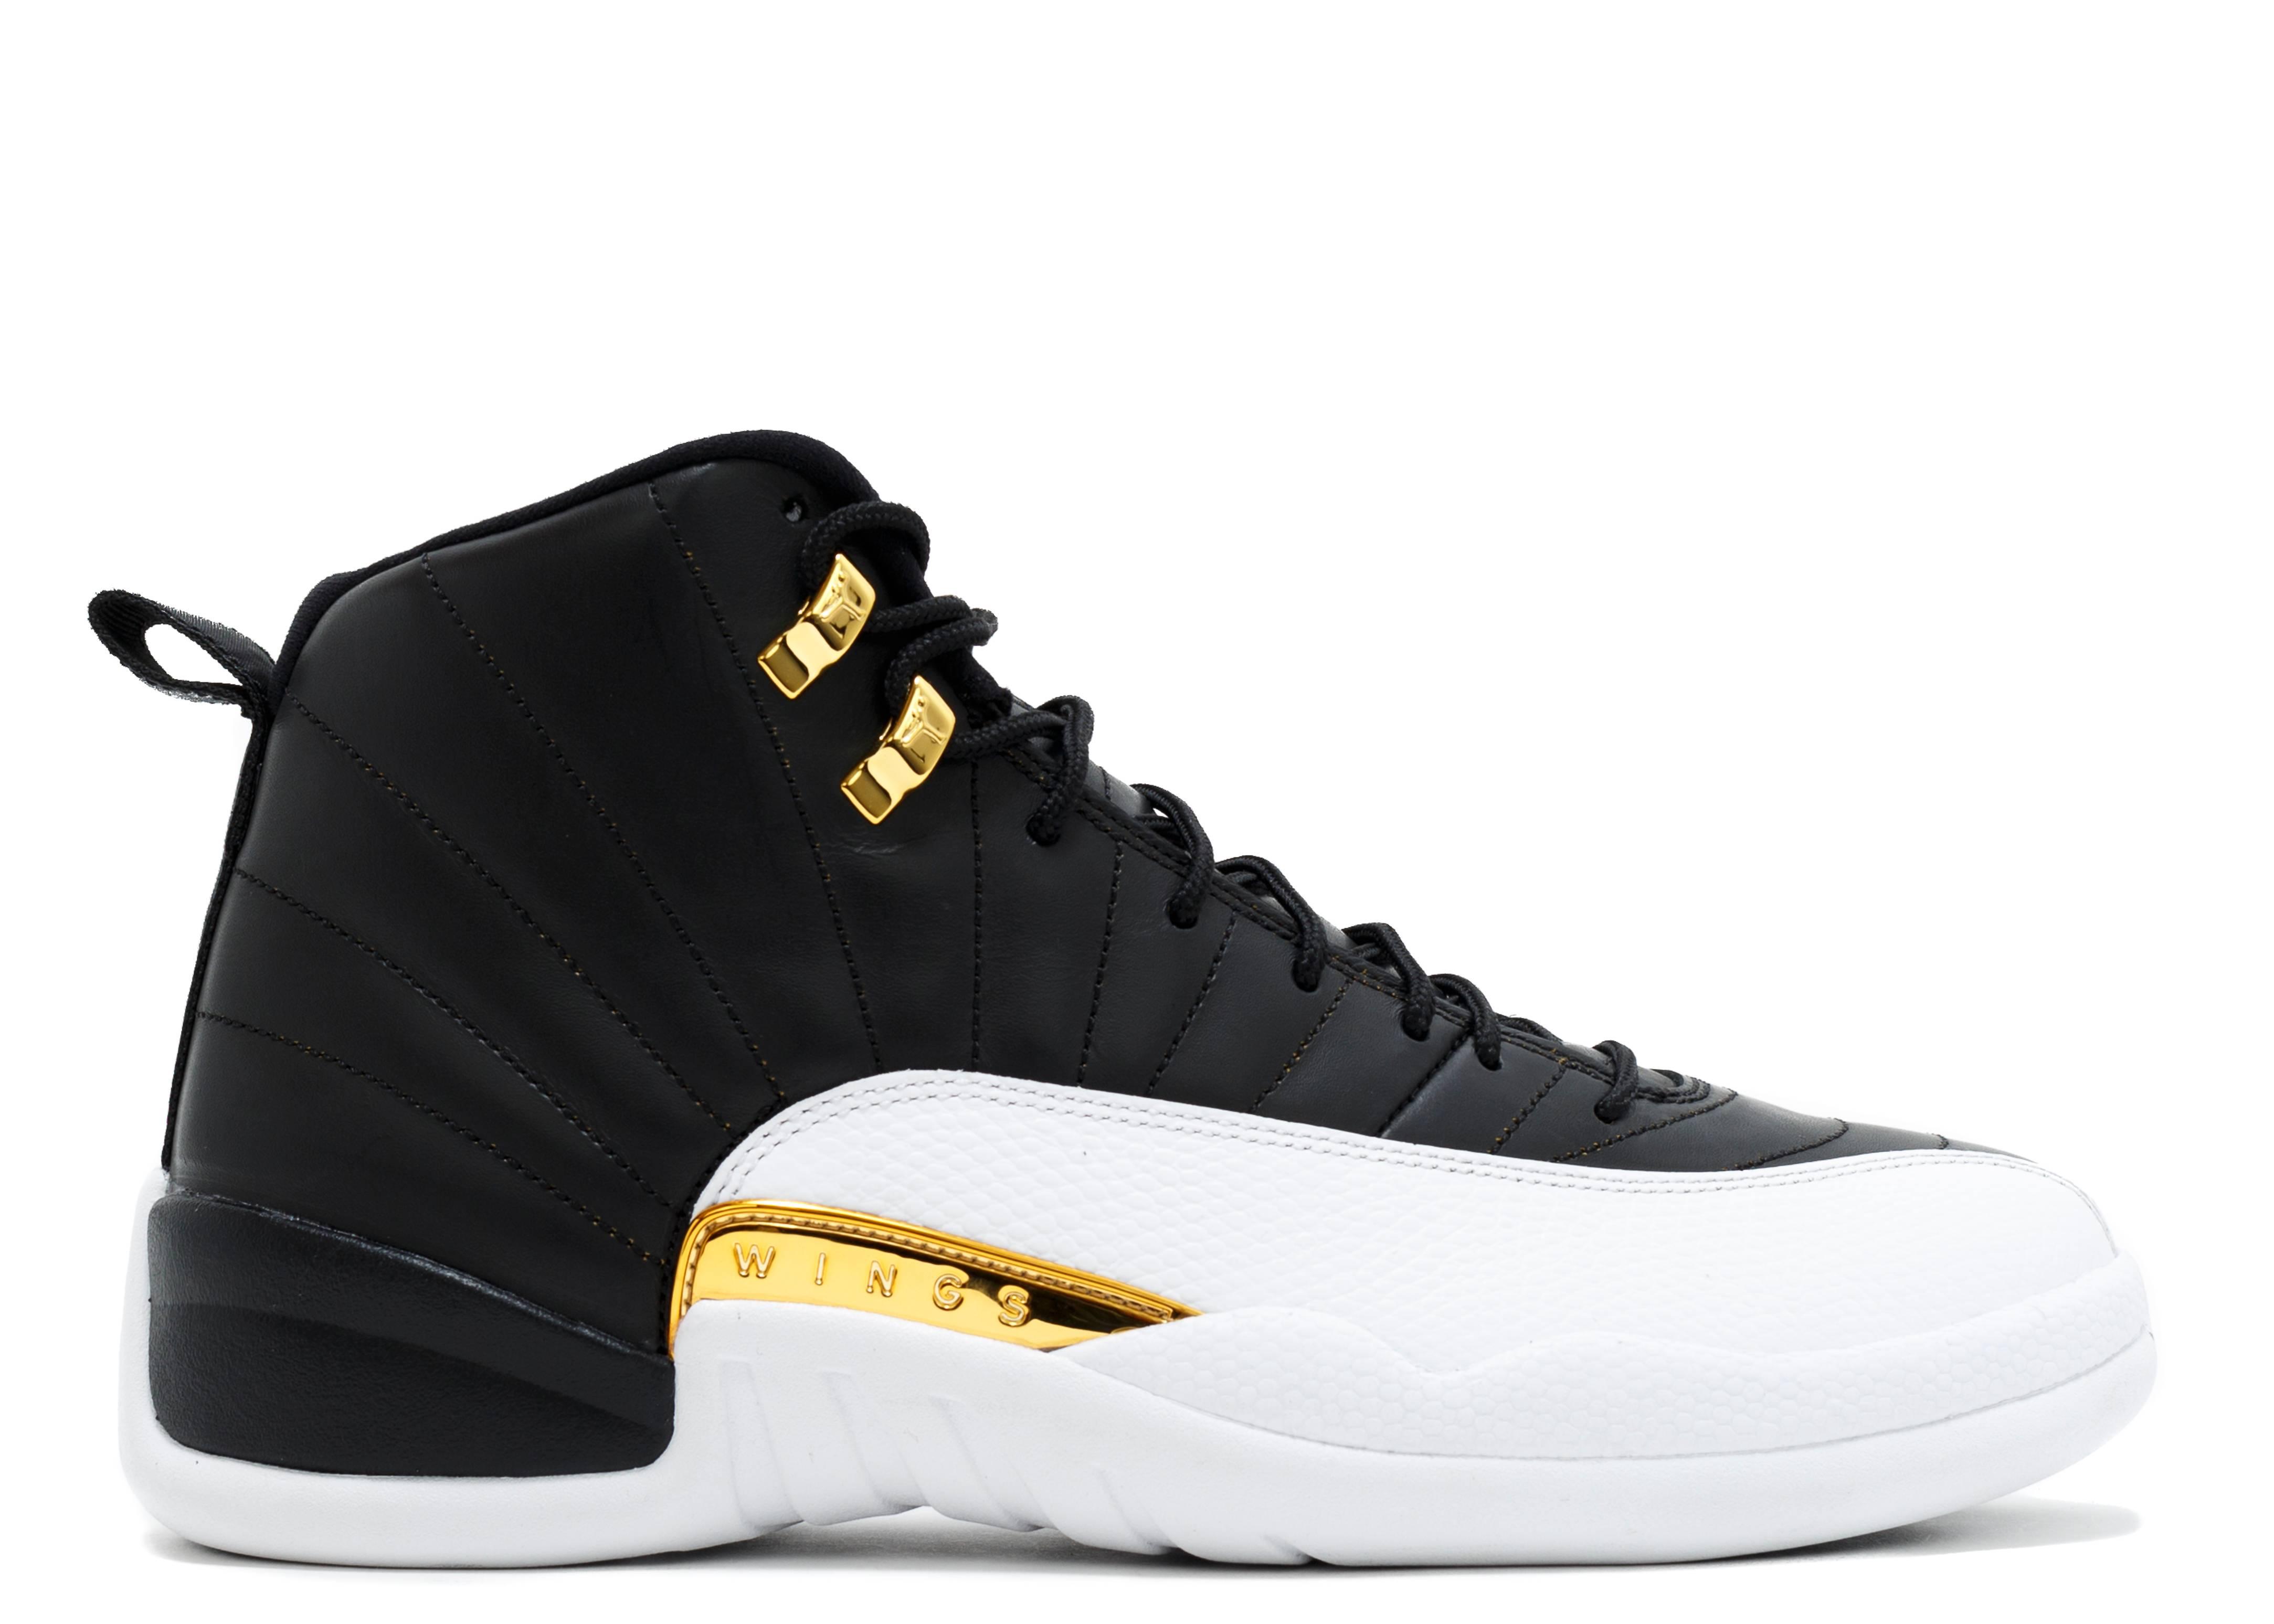 Jordans 12 Ovo